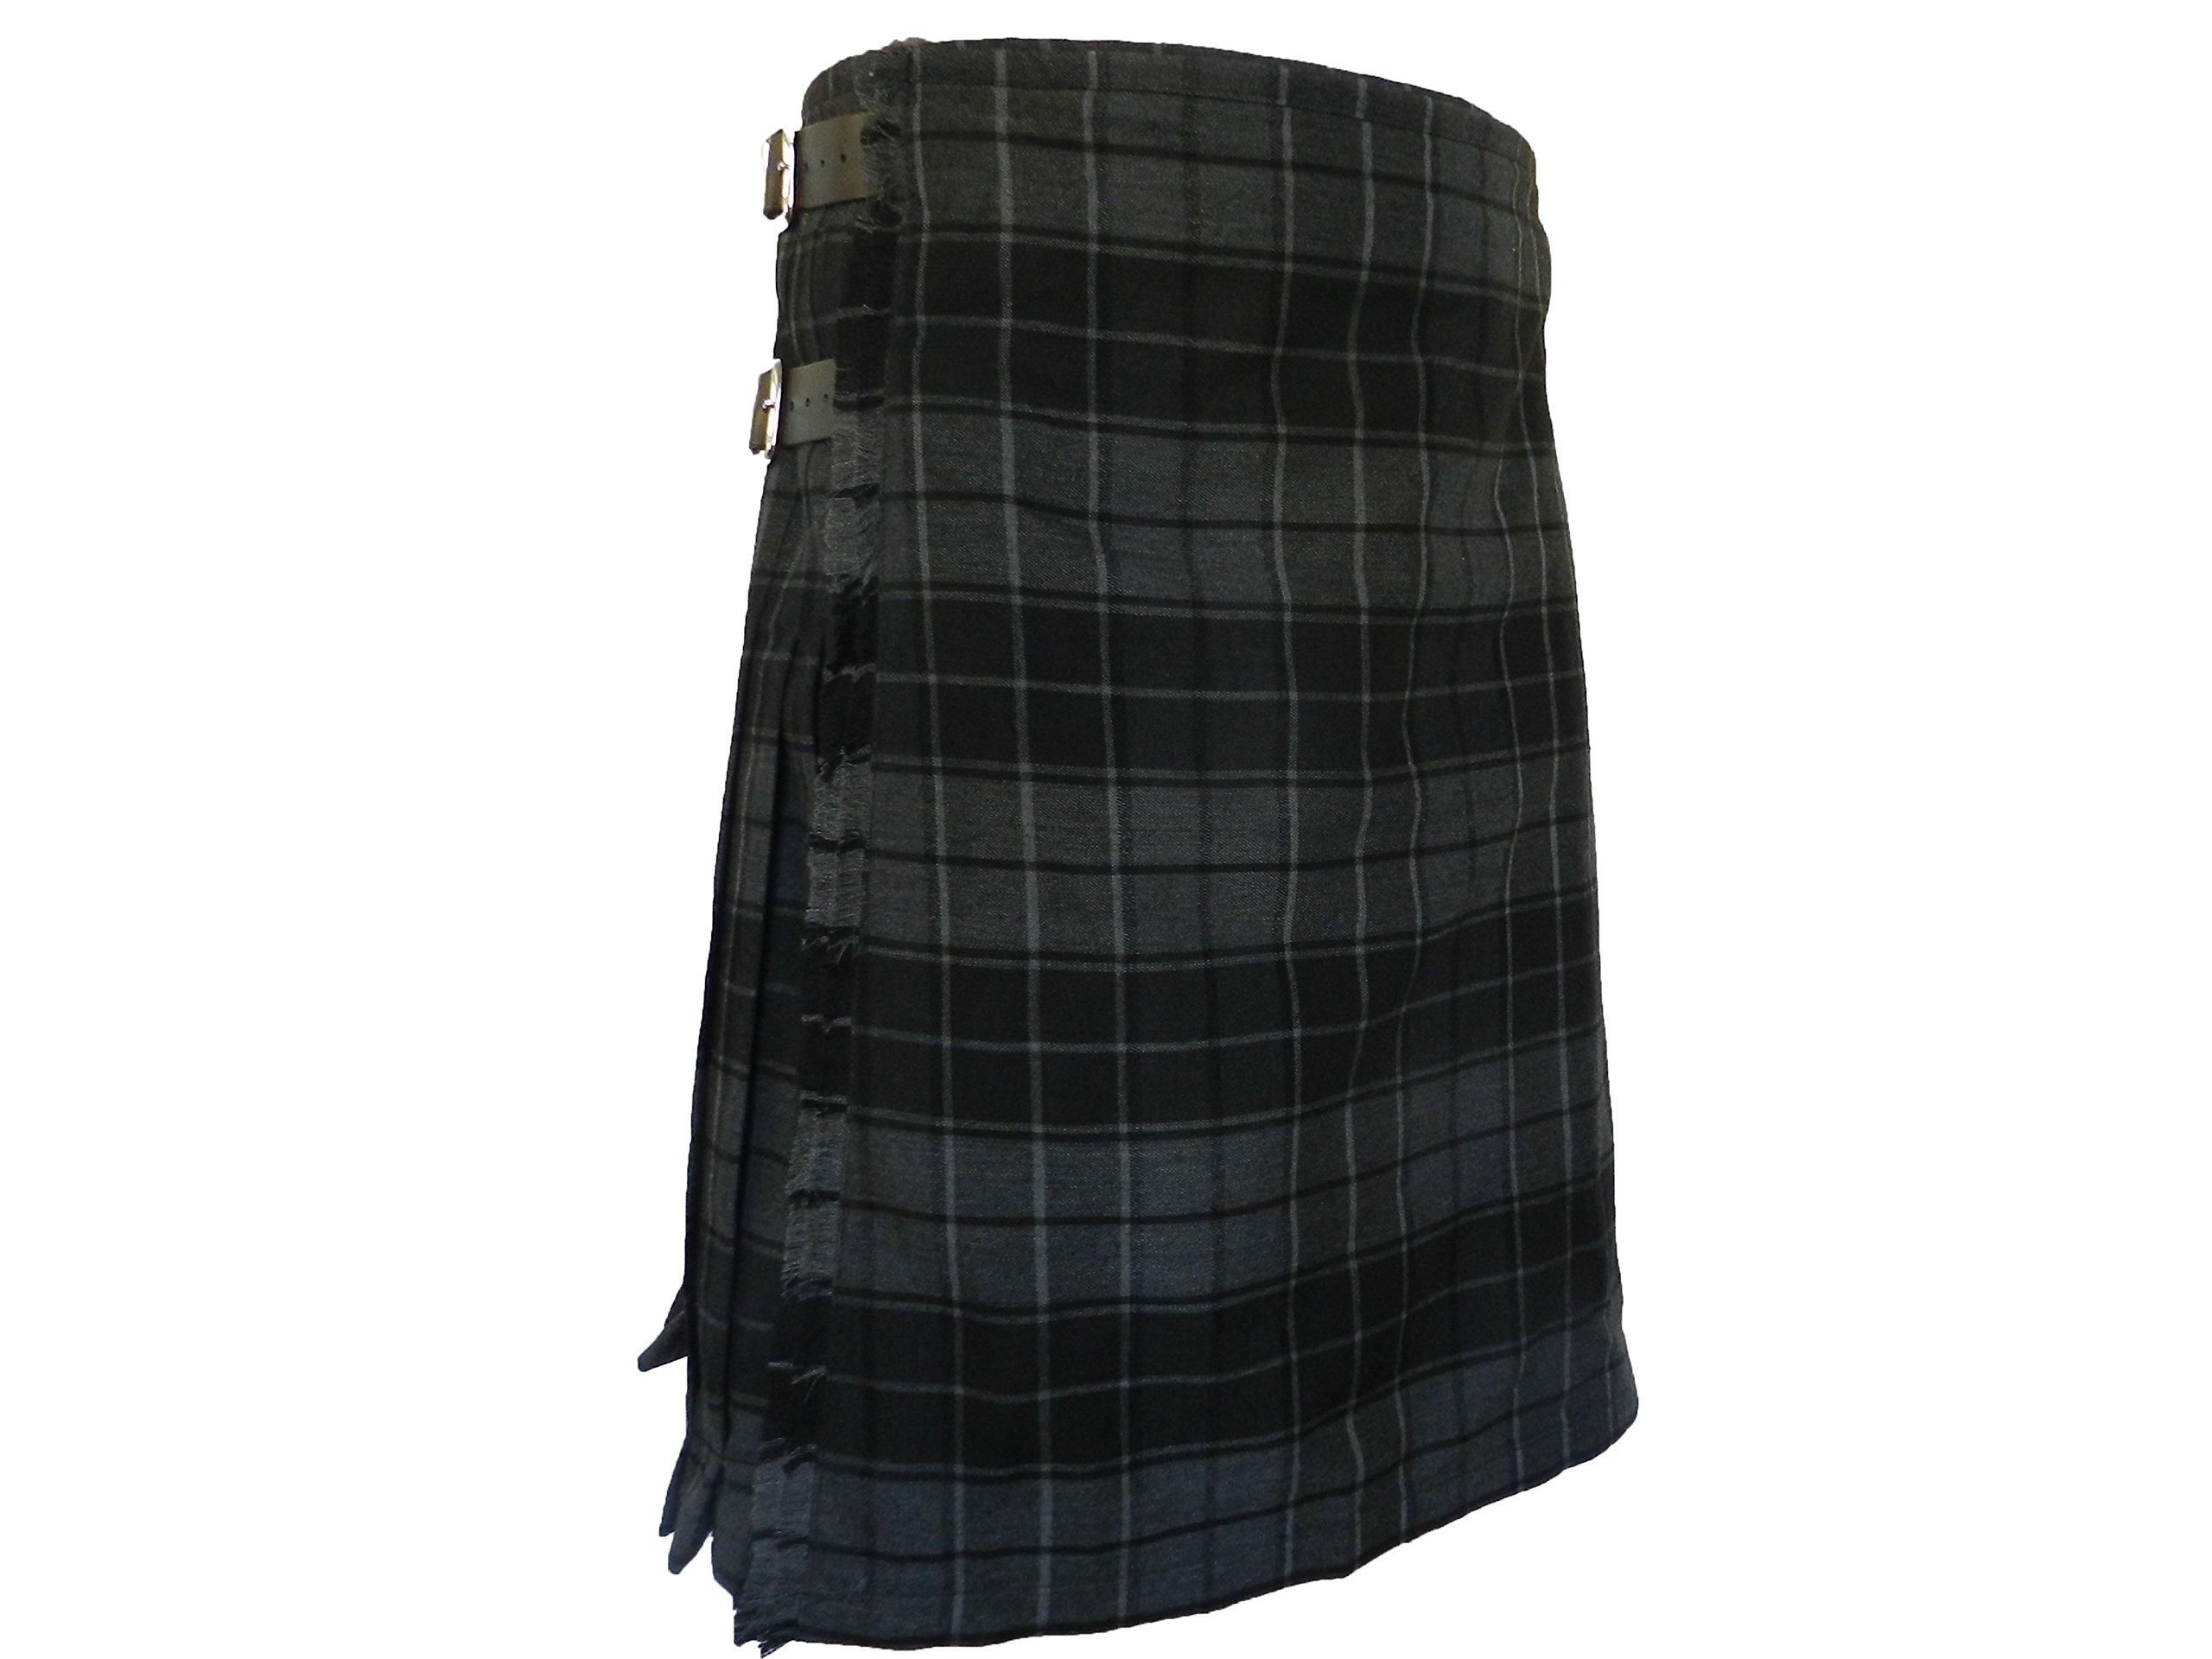 100% 13 oz Wool Scottish Kilts - UT Kilts (40, Gray Highlander)